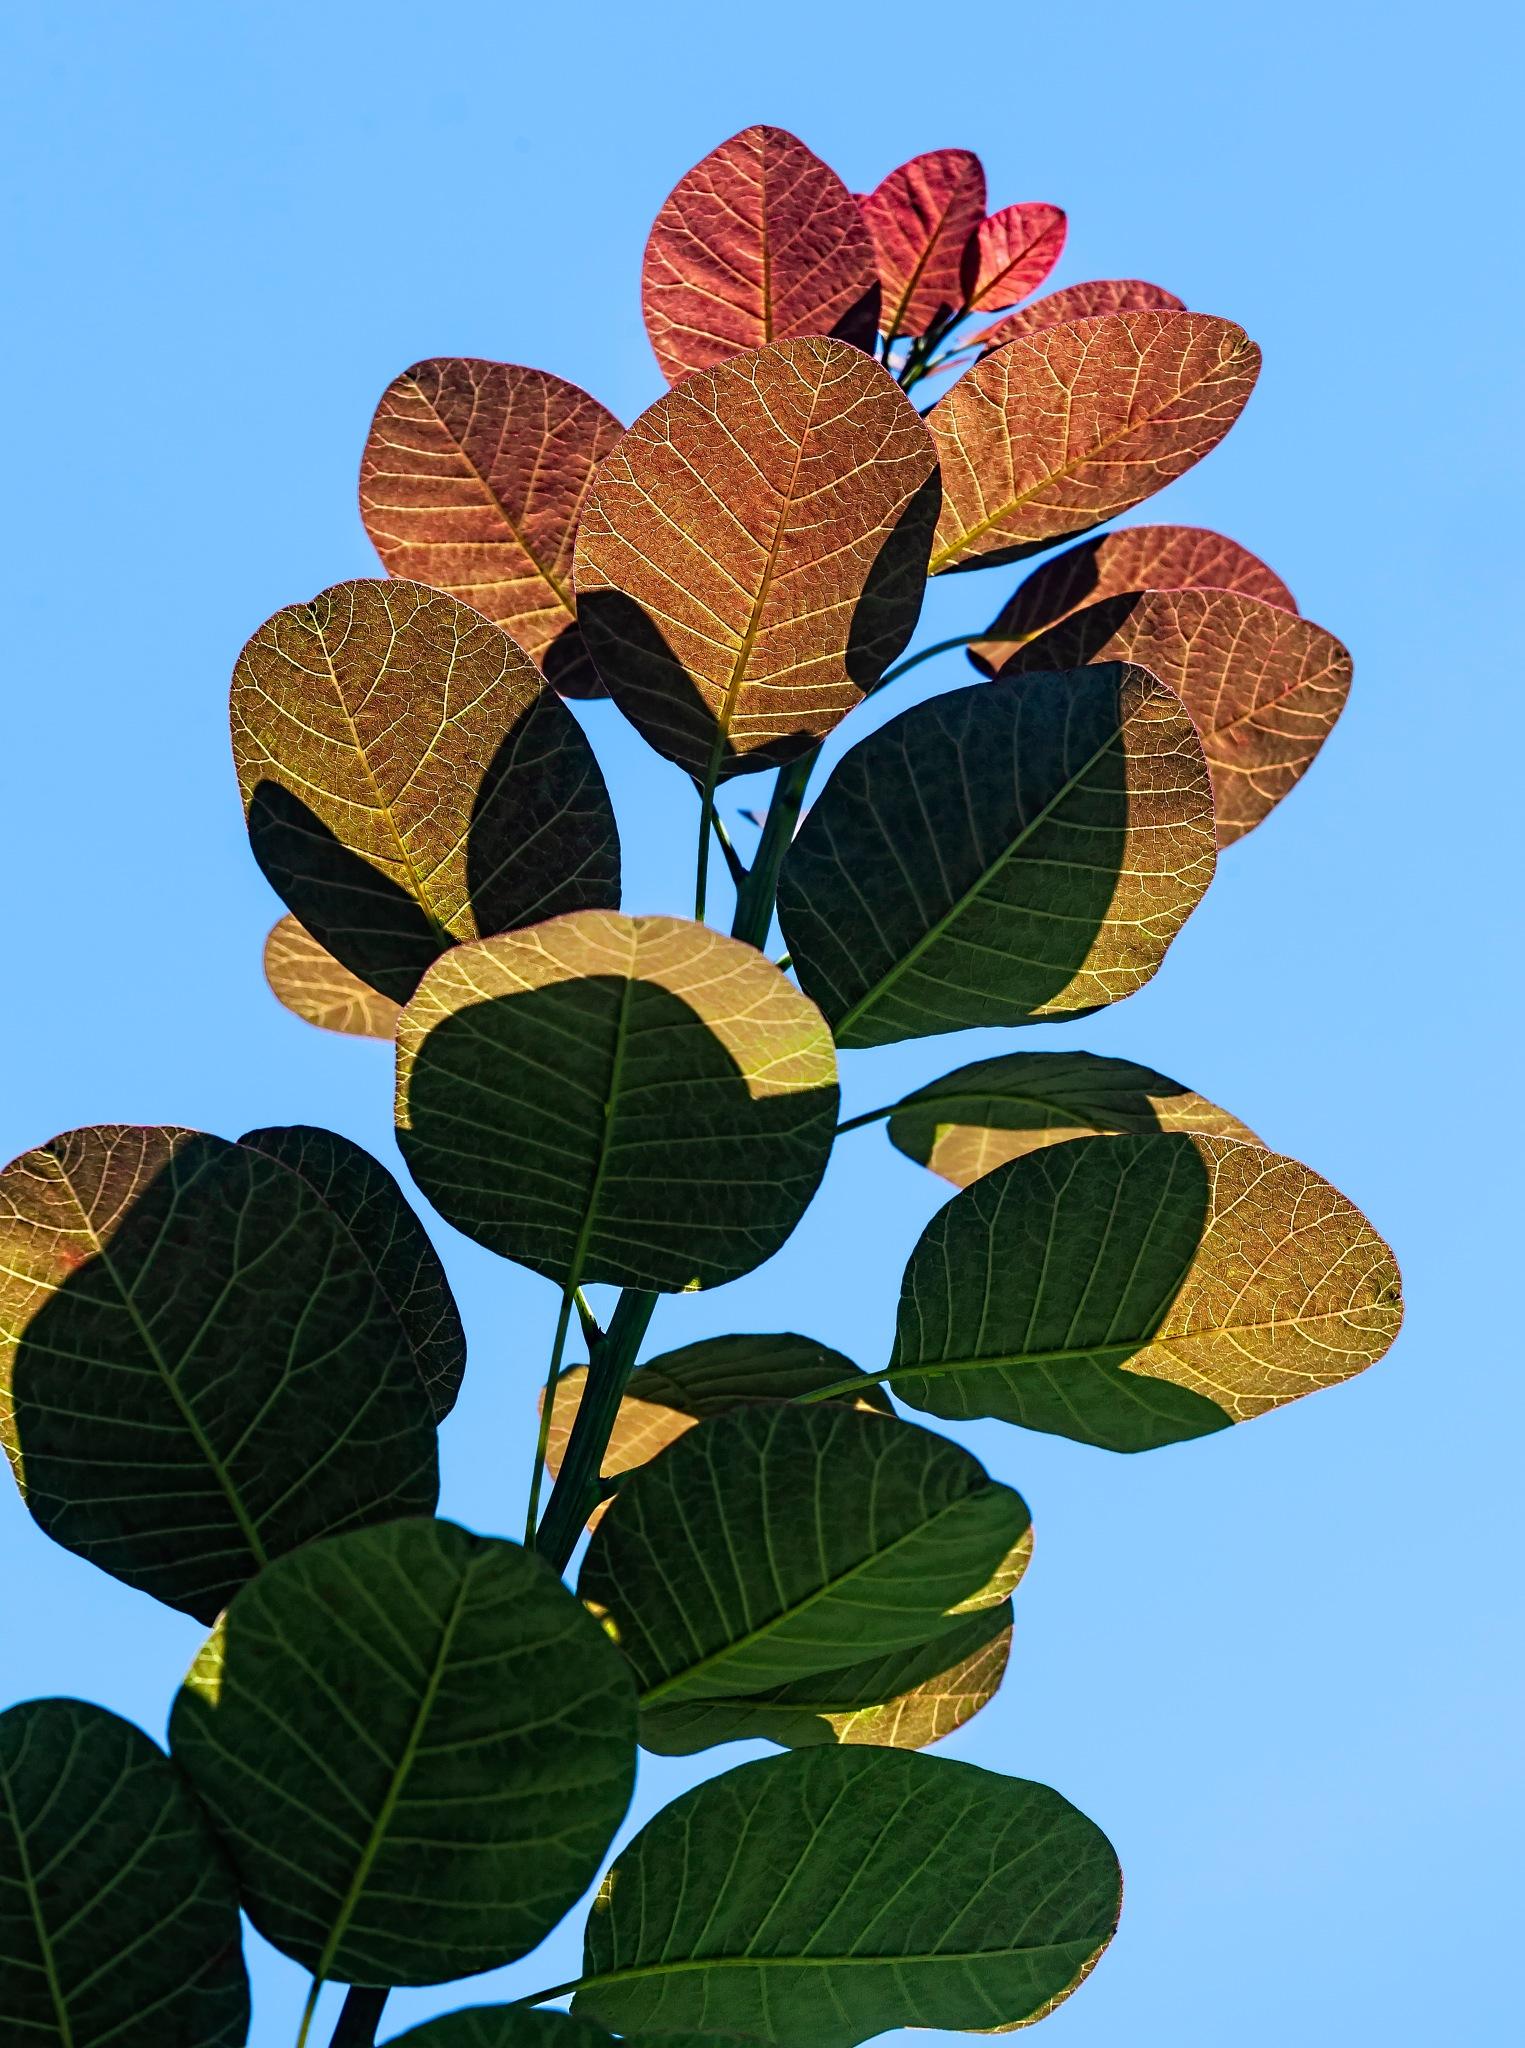 Back Lit Leaves by robertullmann